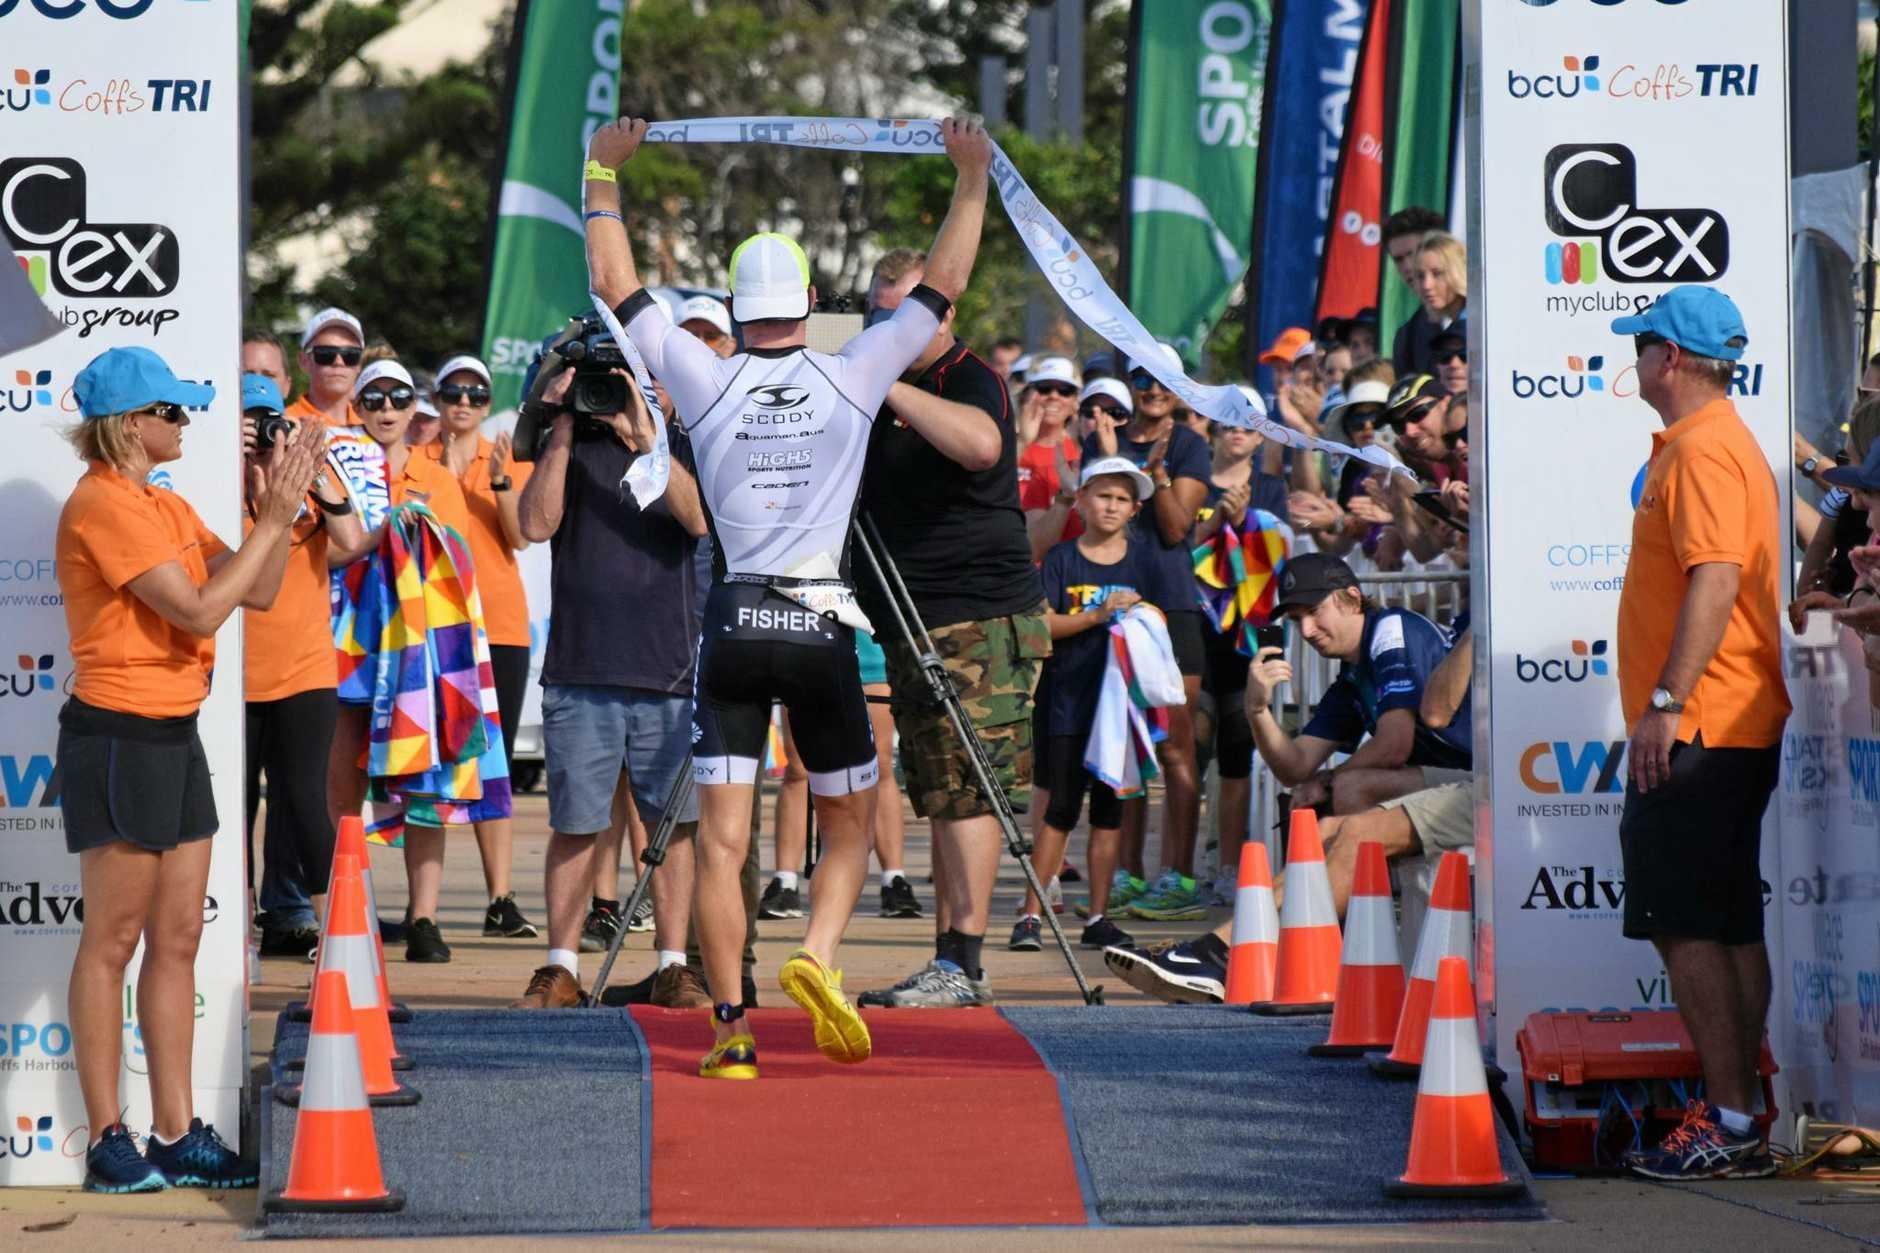 WINNER: Ryan Fisher crosses the bcu Coffs Tri finish line in race record time. 5 March 2017 triathlon Photo: Brad Greenshields/Coffs Coast Advocate